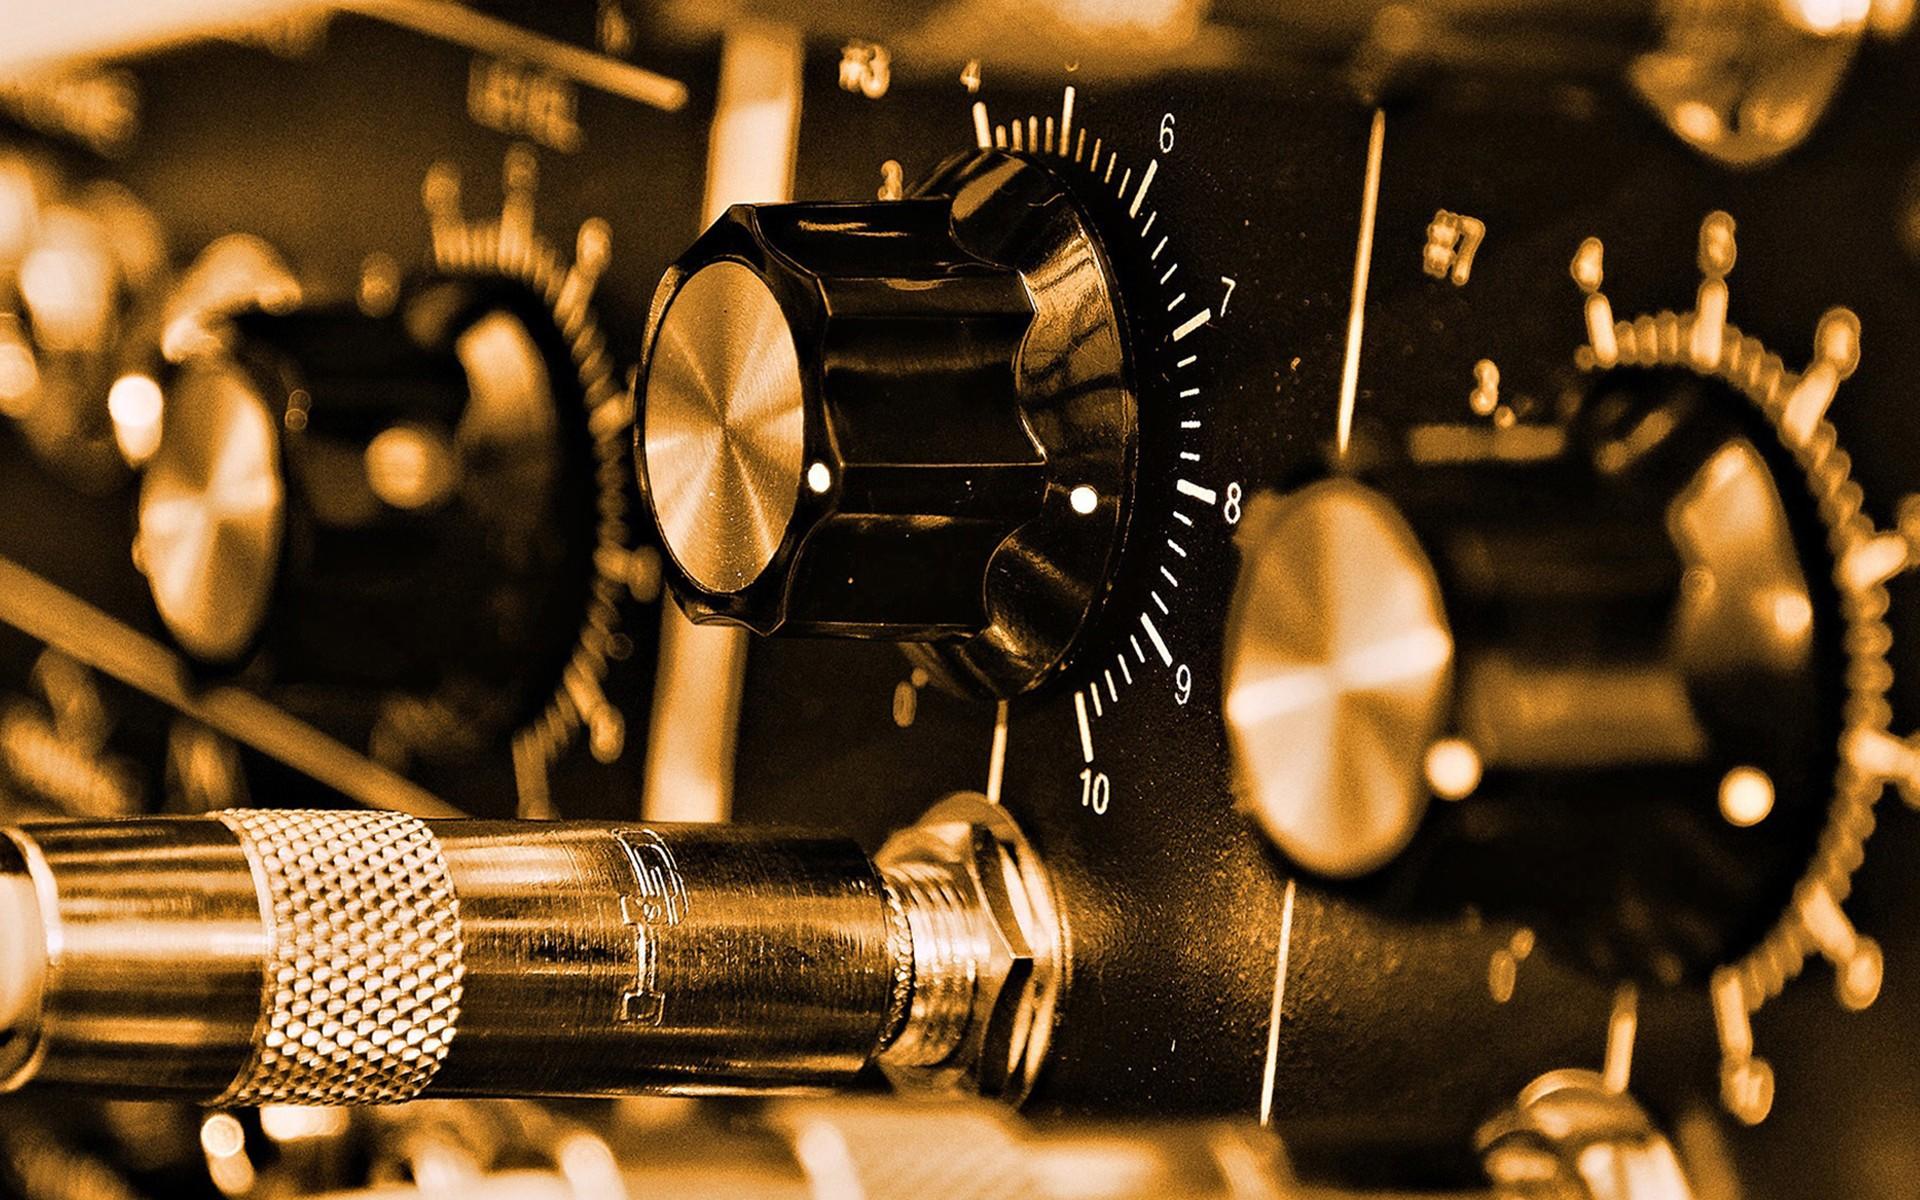 Rock And Roll Wallpaper Hd デスクトップ壁紙 ギター 楽器 写真 音楽 セピア 金属 ドラム アンプ 光 マクロ撮影